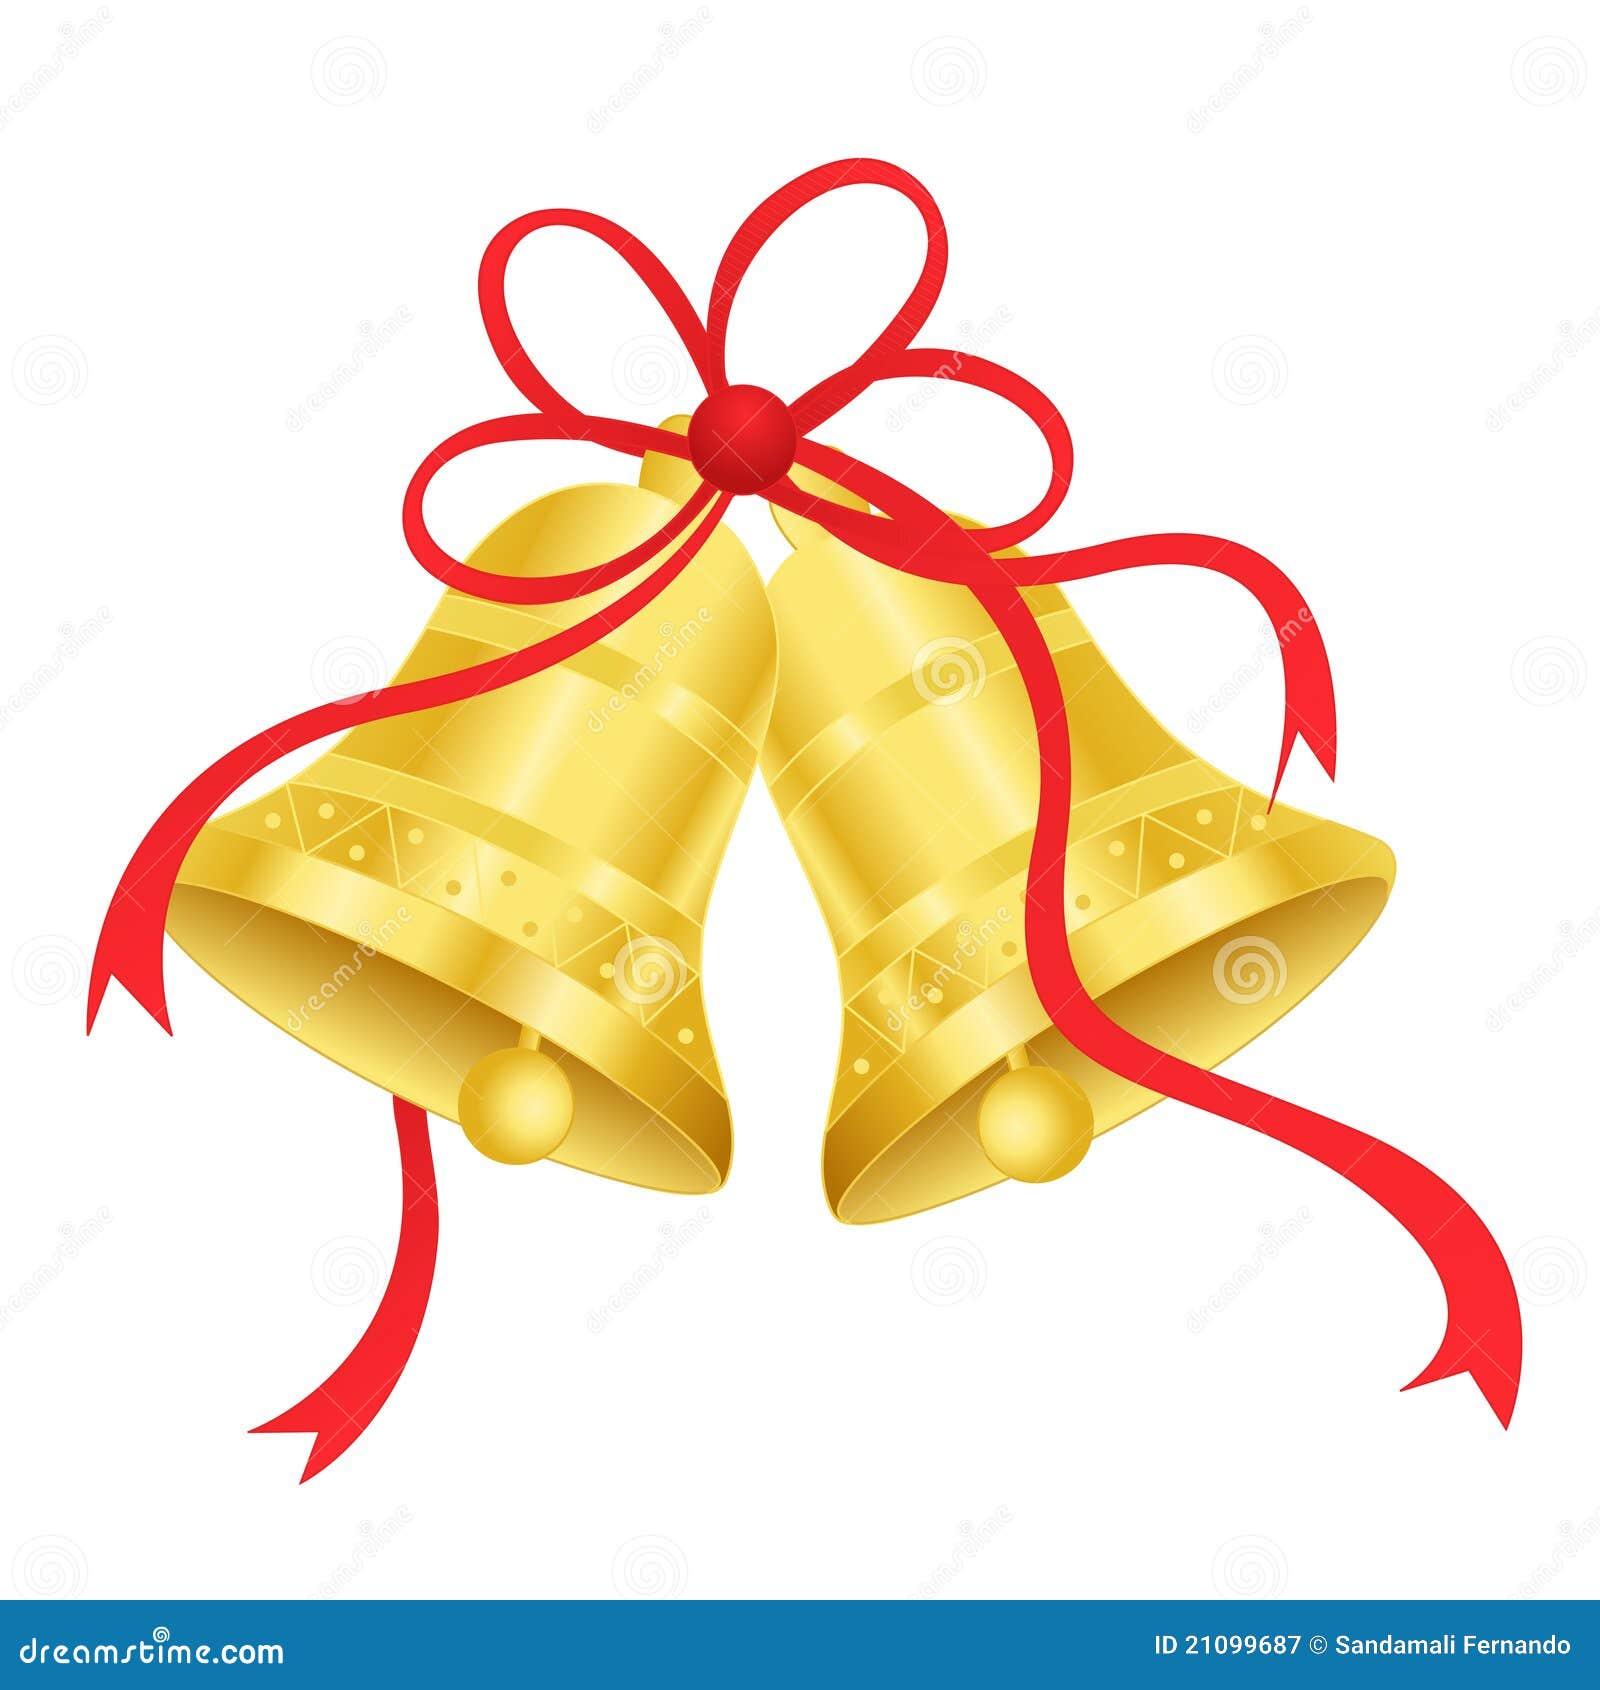 Gold / golden bells stock vector. Image of festive, angel ...